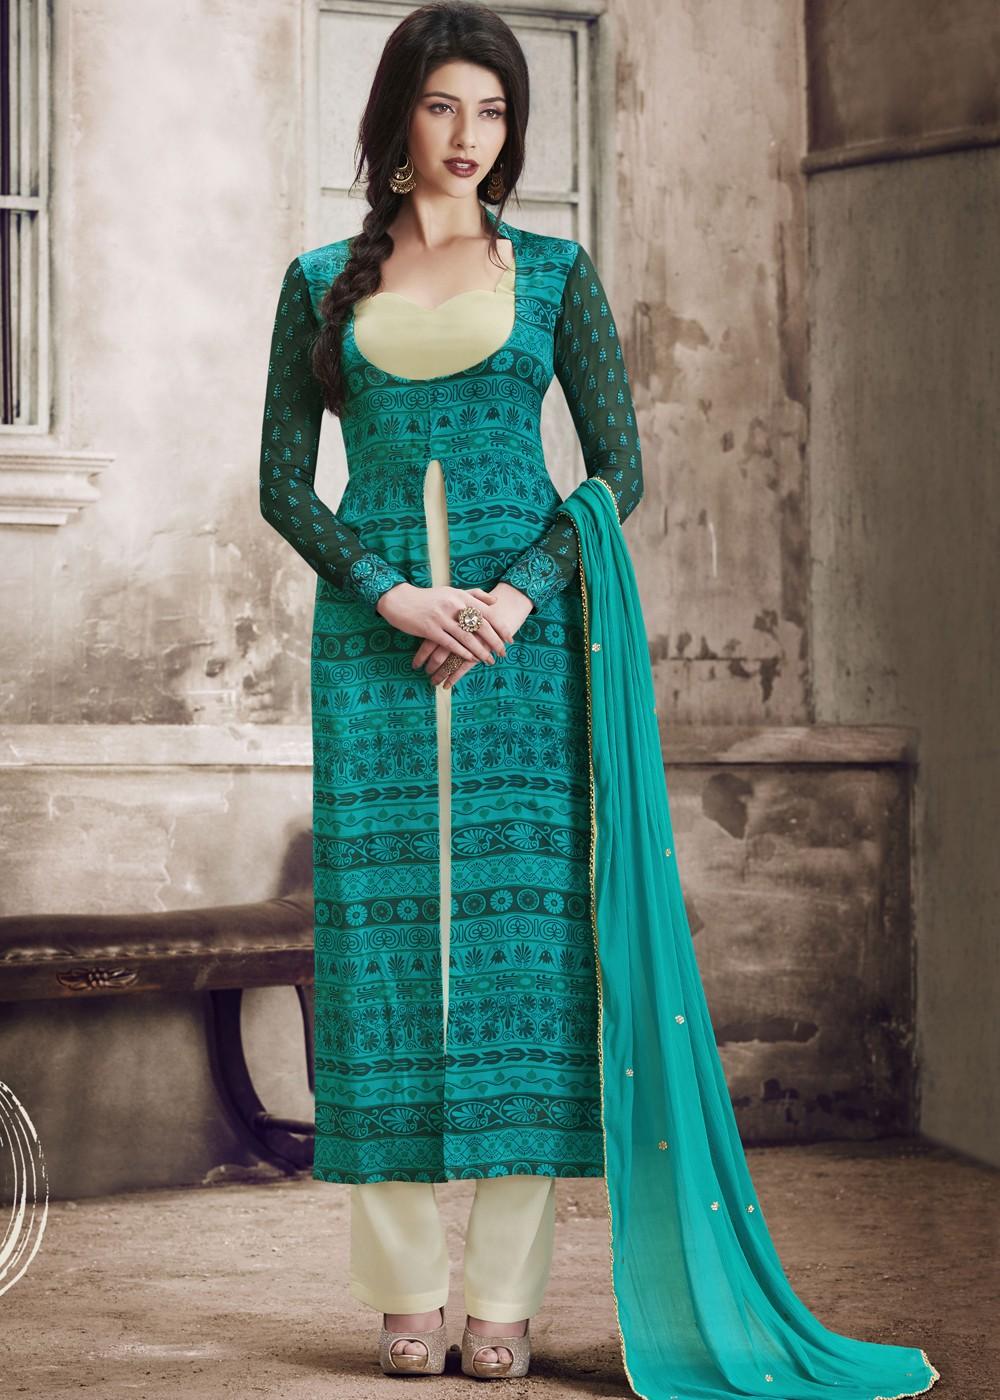 Turquoise Twin Layered Pant Suit Salwar Kameez 1508SL05